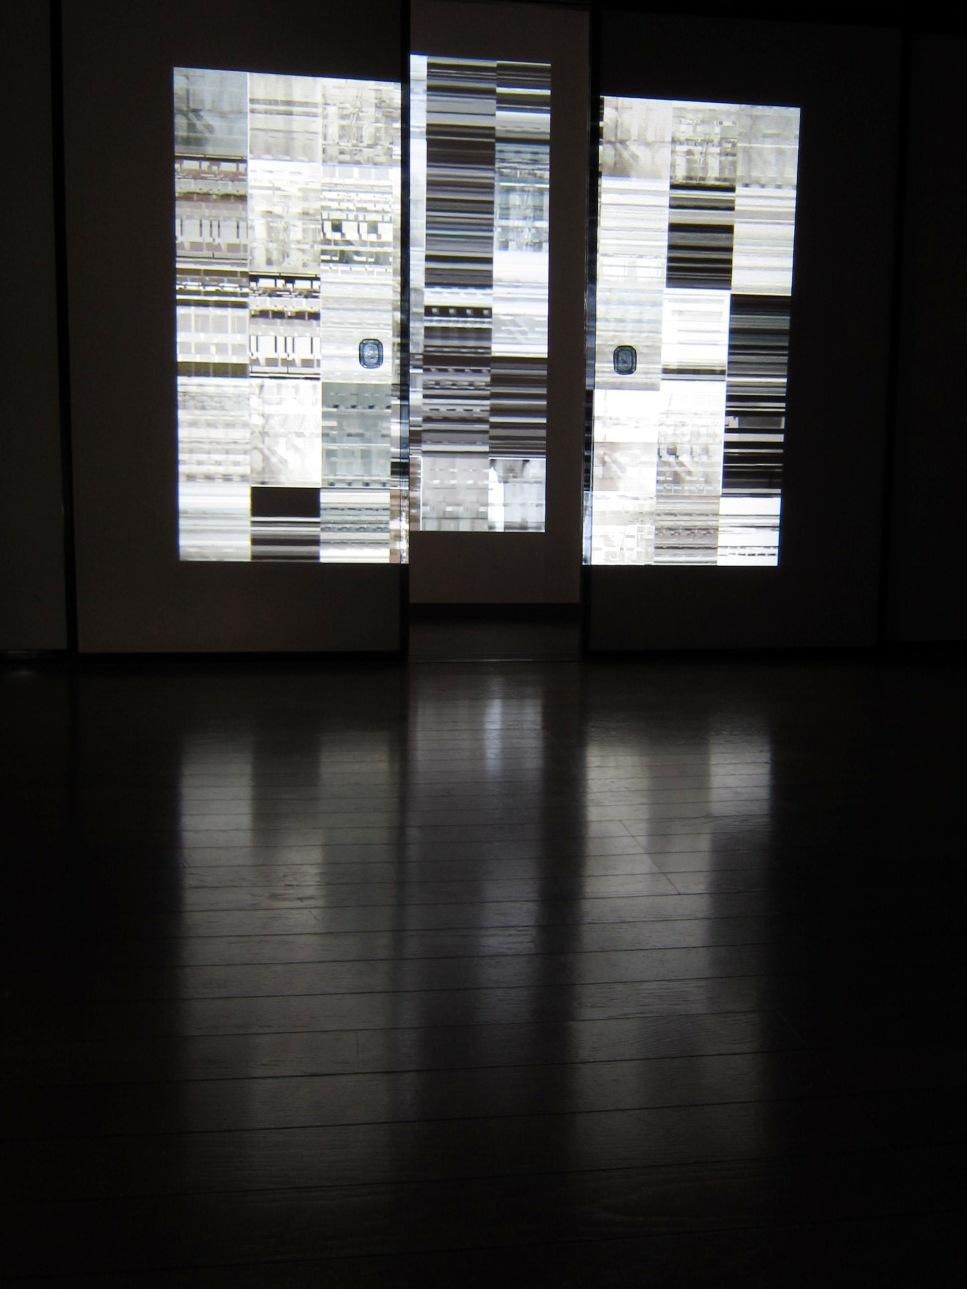 2035)「上野麗市 個展 『De\'tente デタント』」 g.犬養 4月17日(水)~4月29日(月)_f0126829_965268.jpg